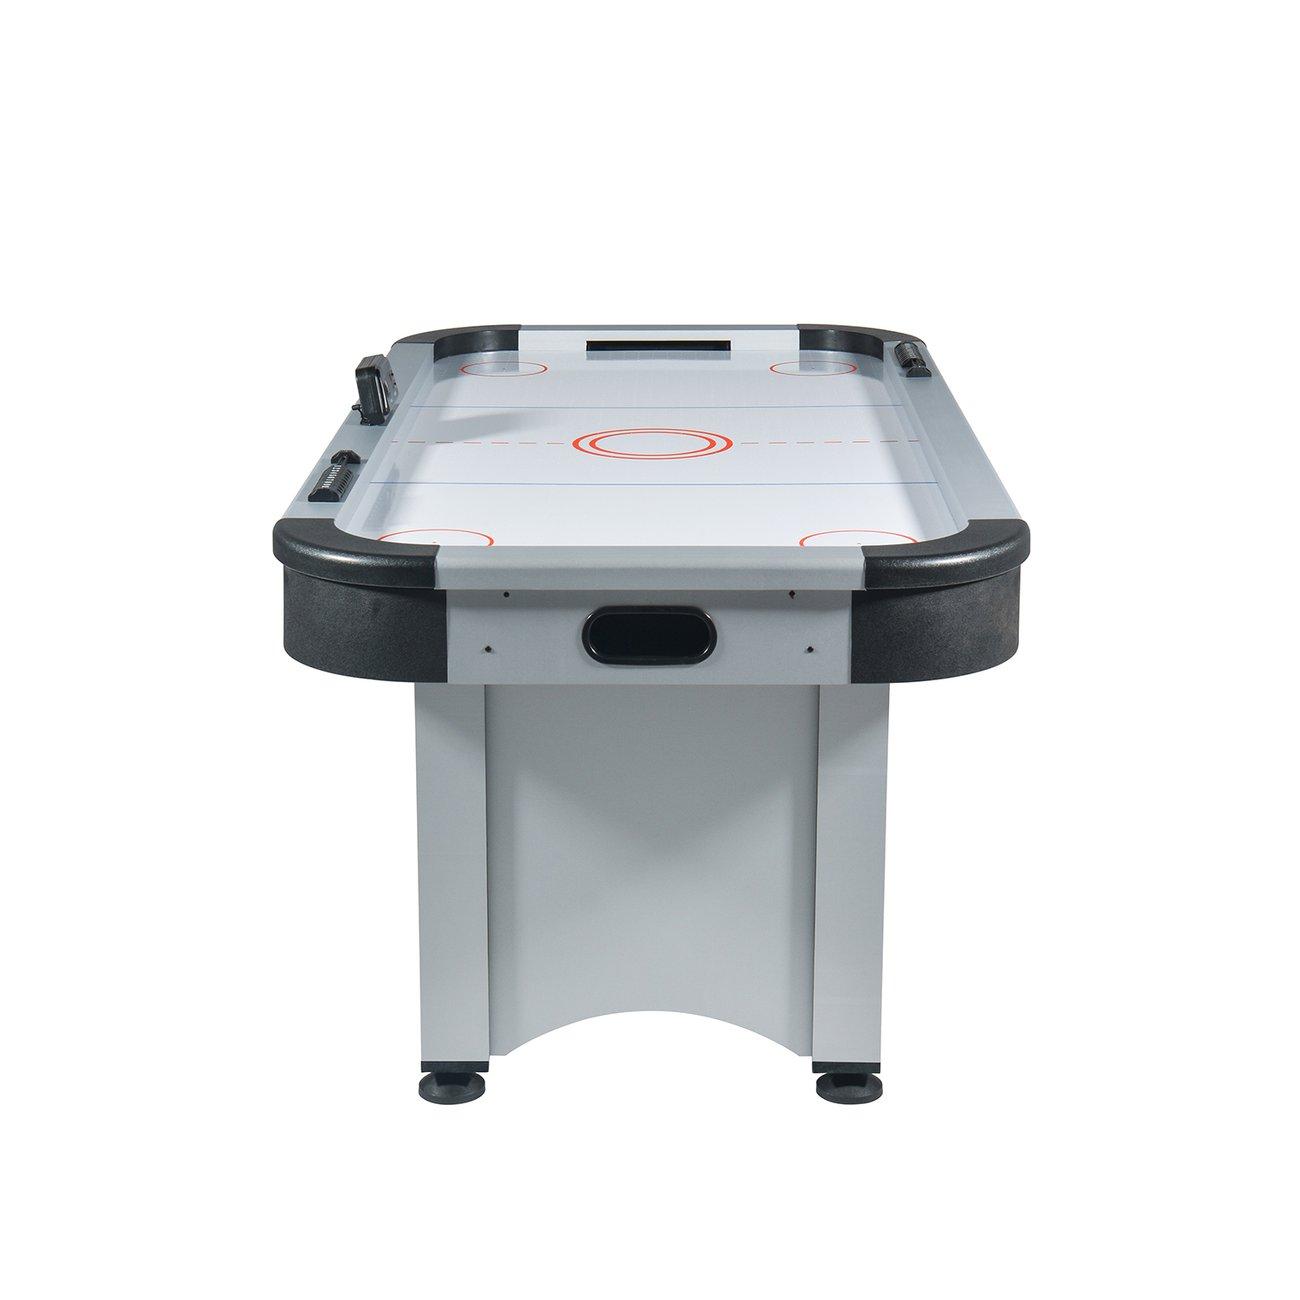 table de air hockey deluxe 185x94cm 3 v2